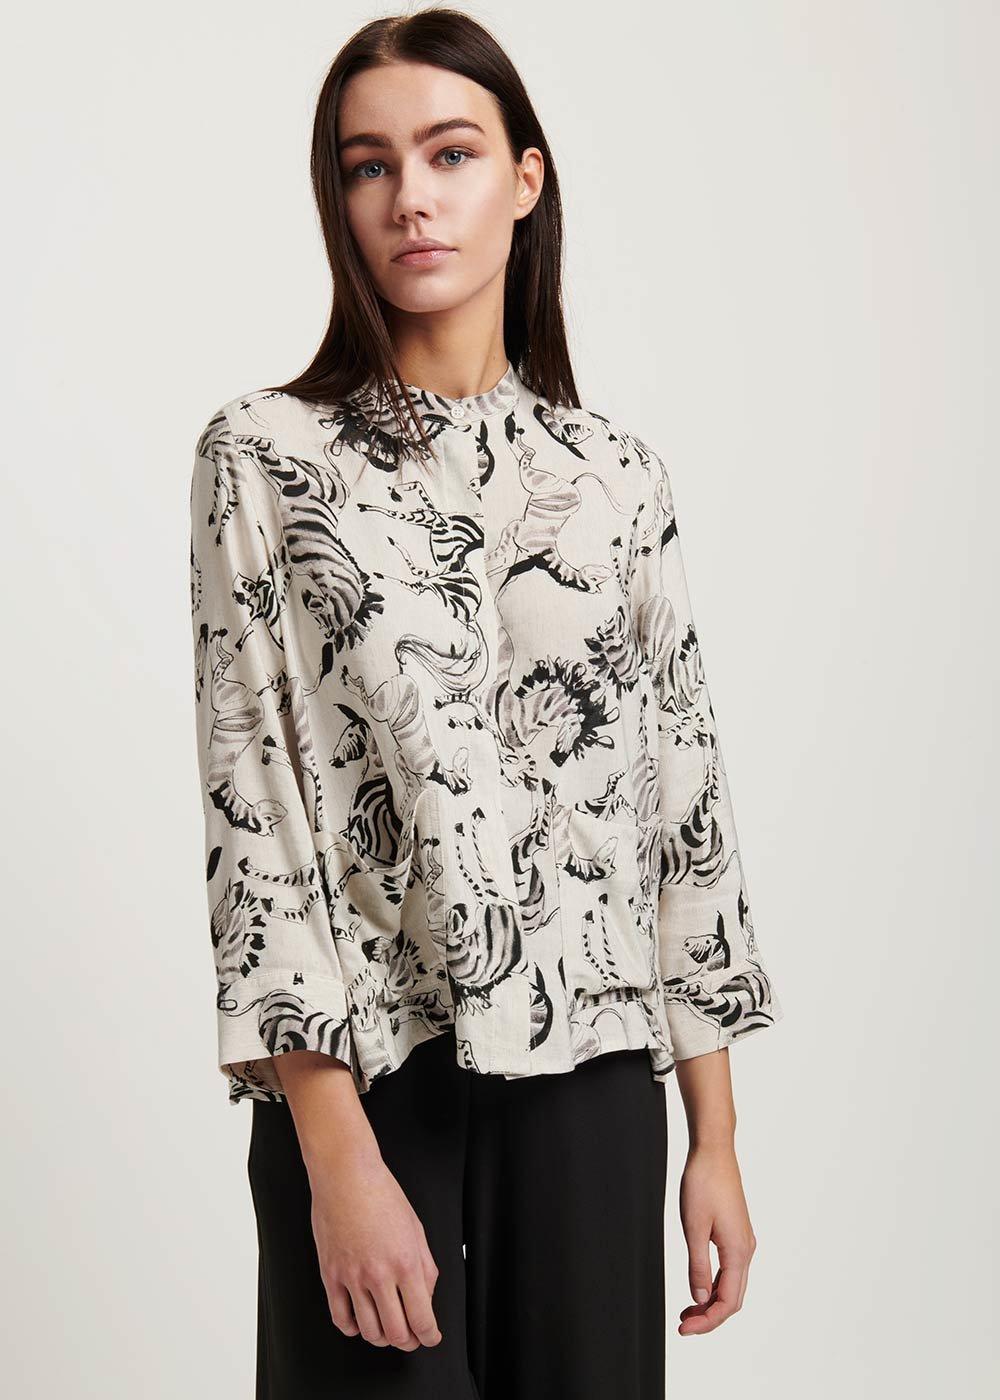 Cynd shirt with zebra print - Beige \ Black Fantasia - Woman